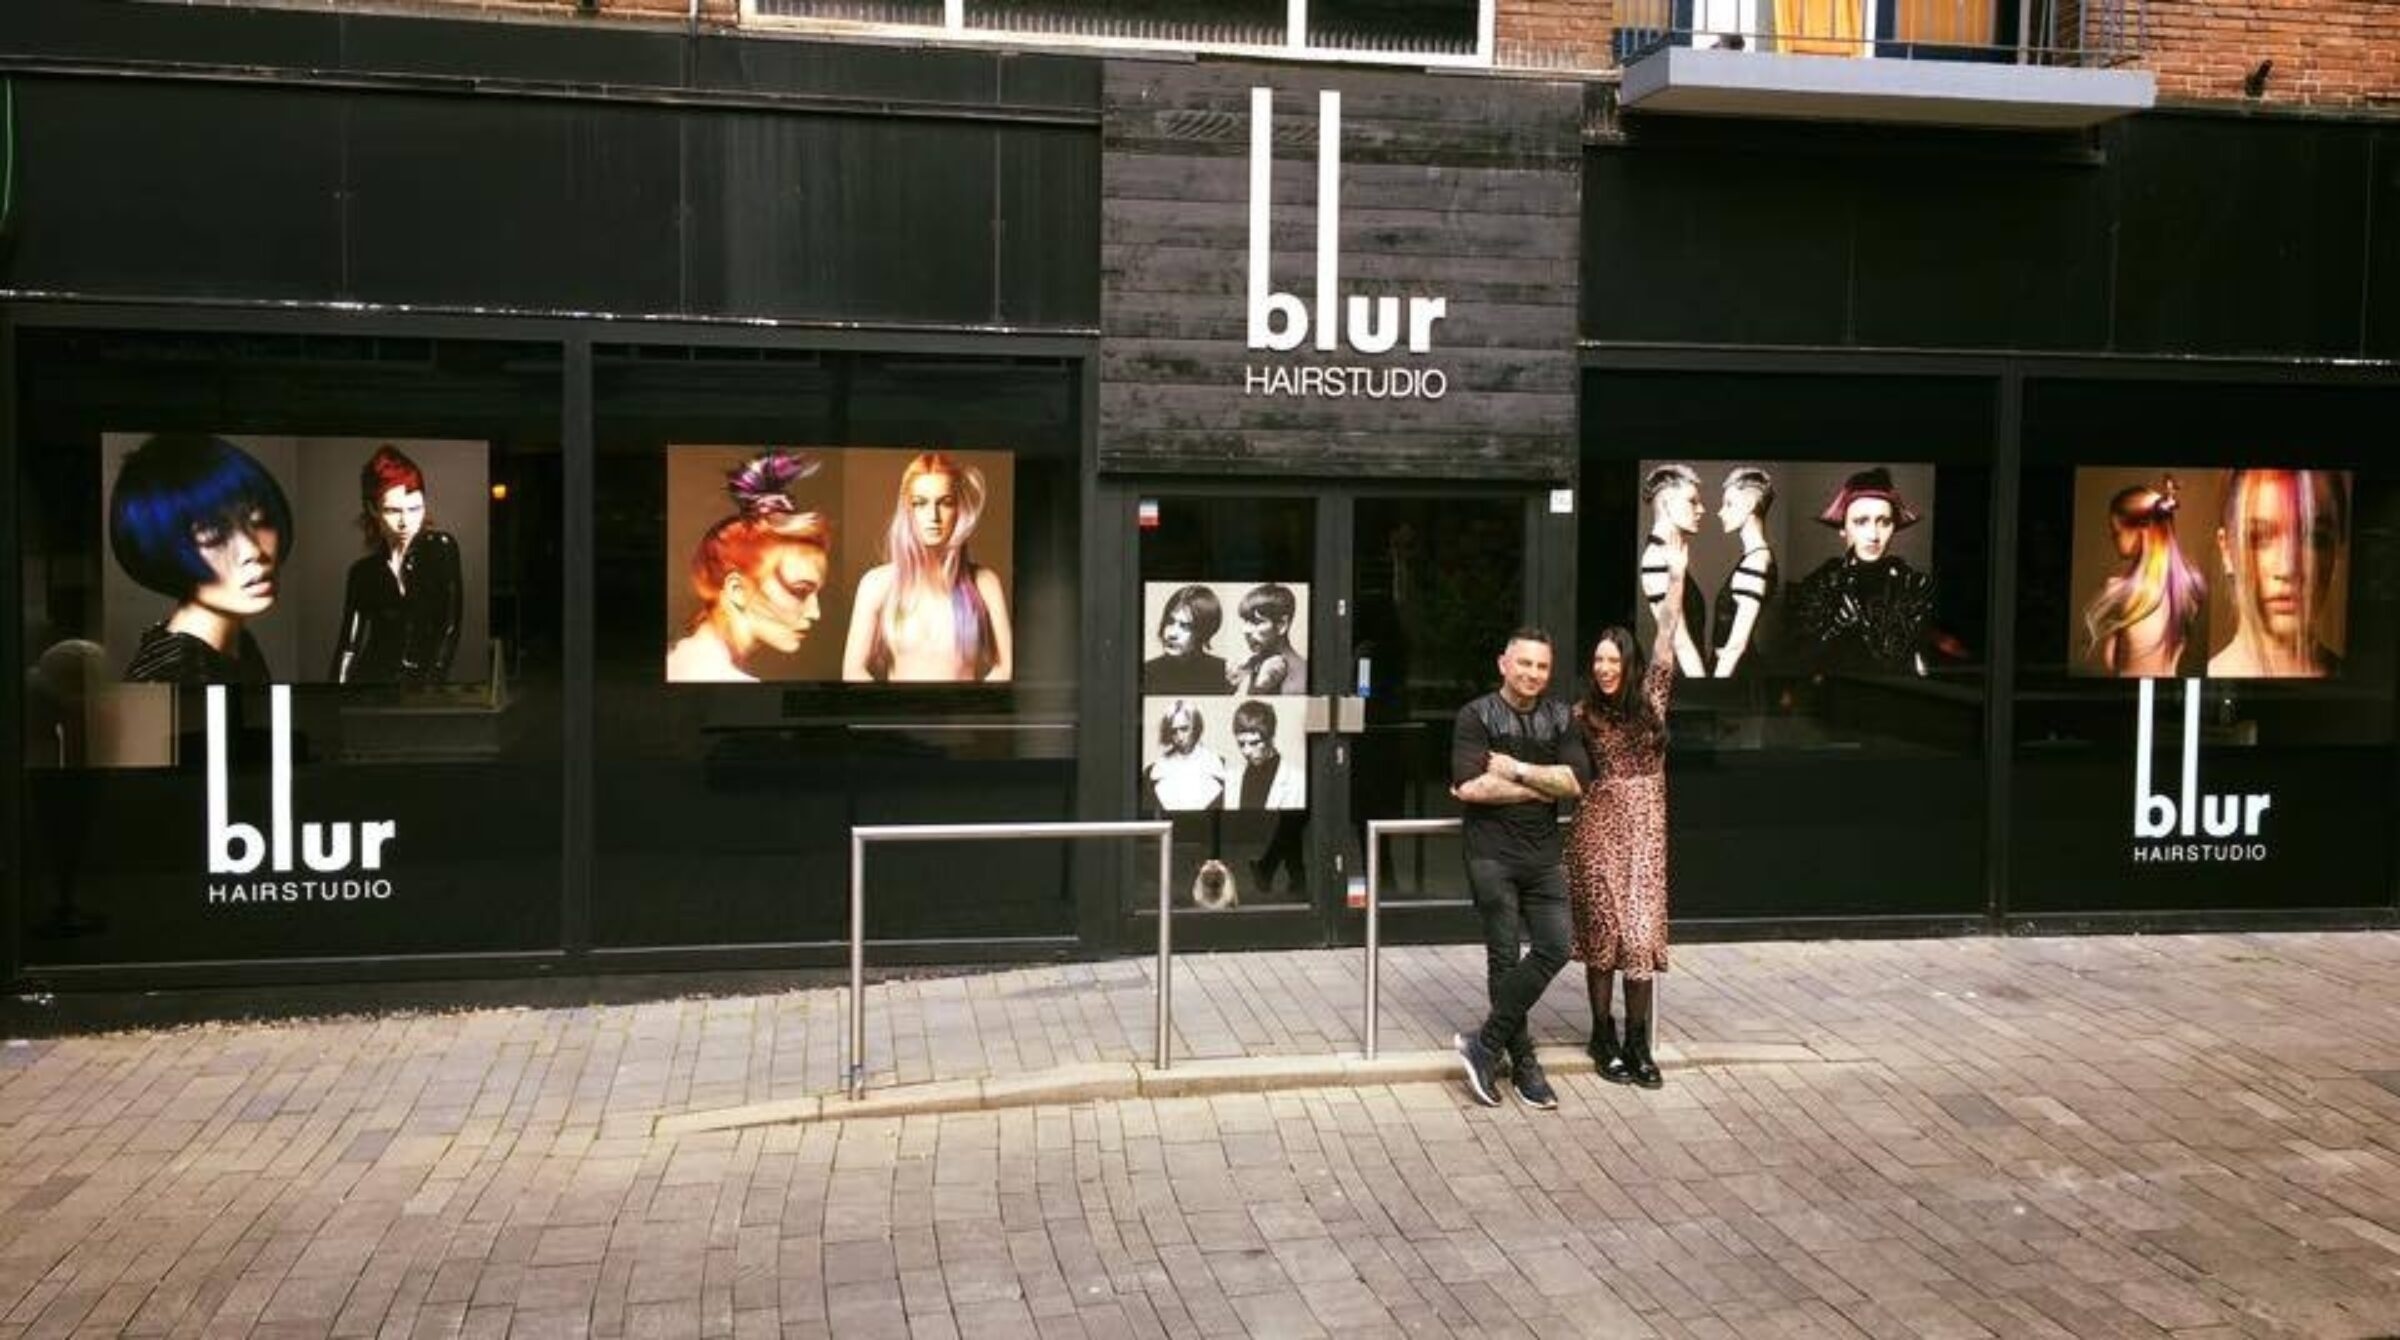 Blur hairstudio enschede2